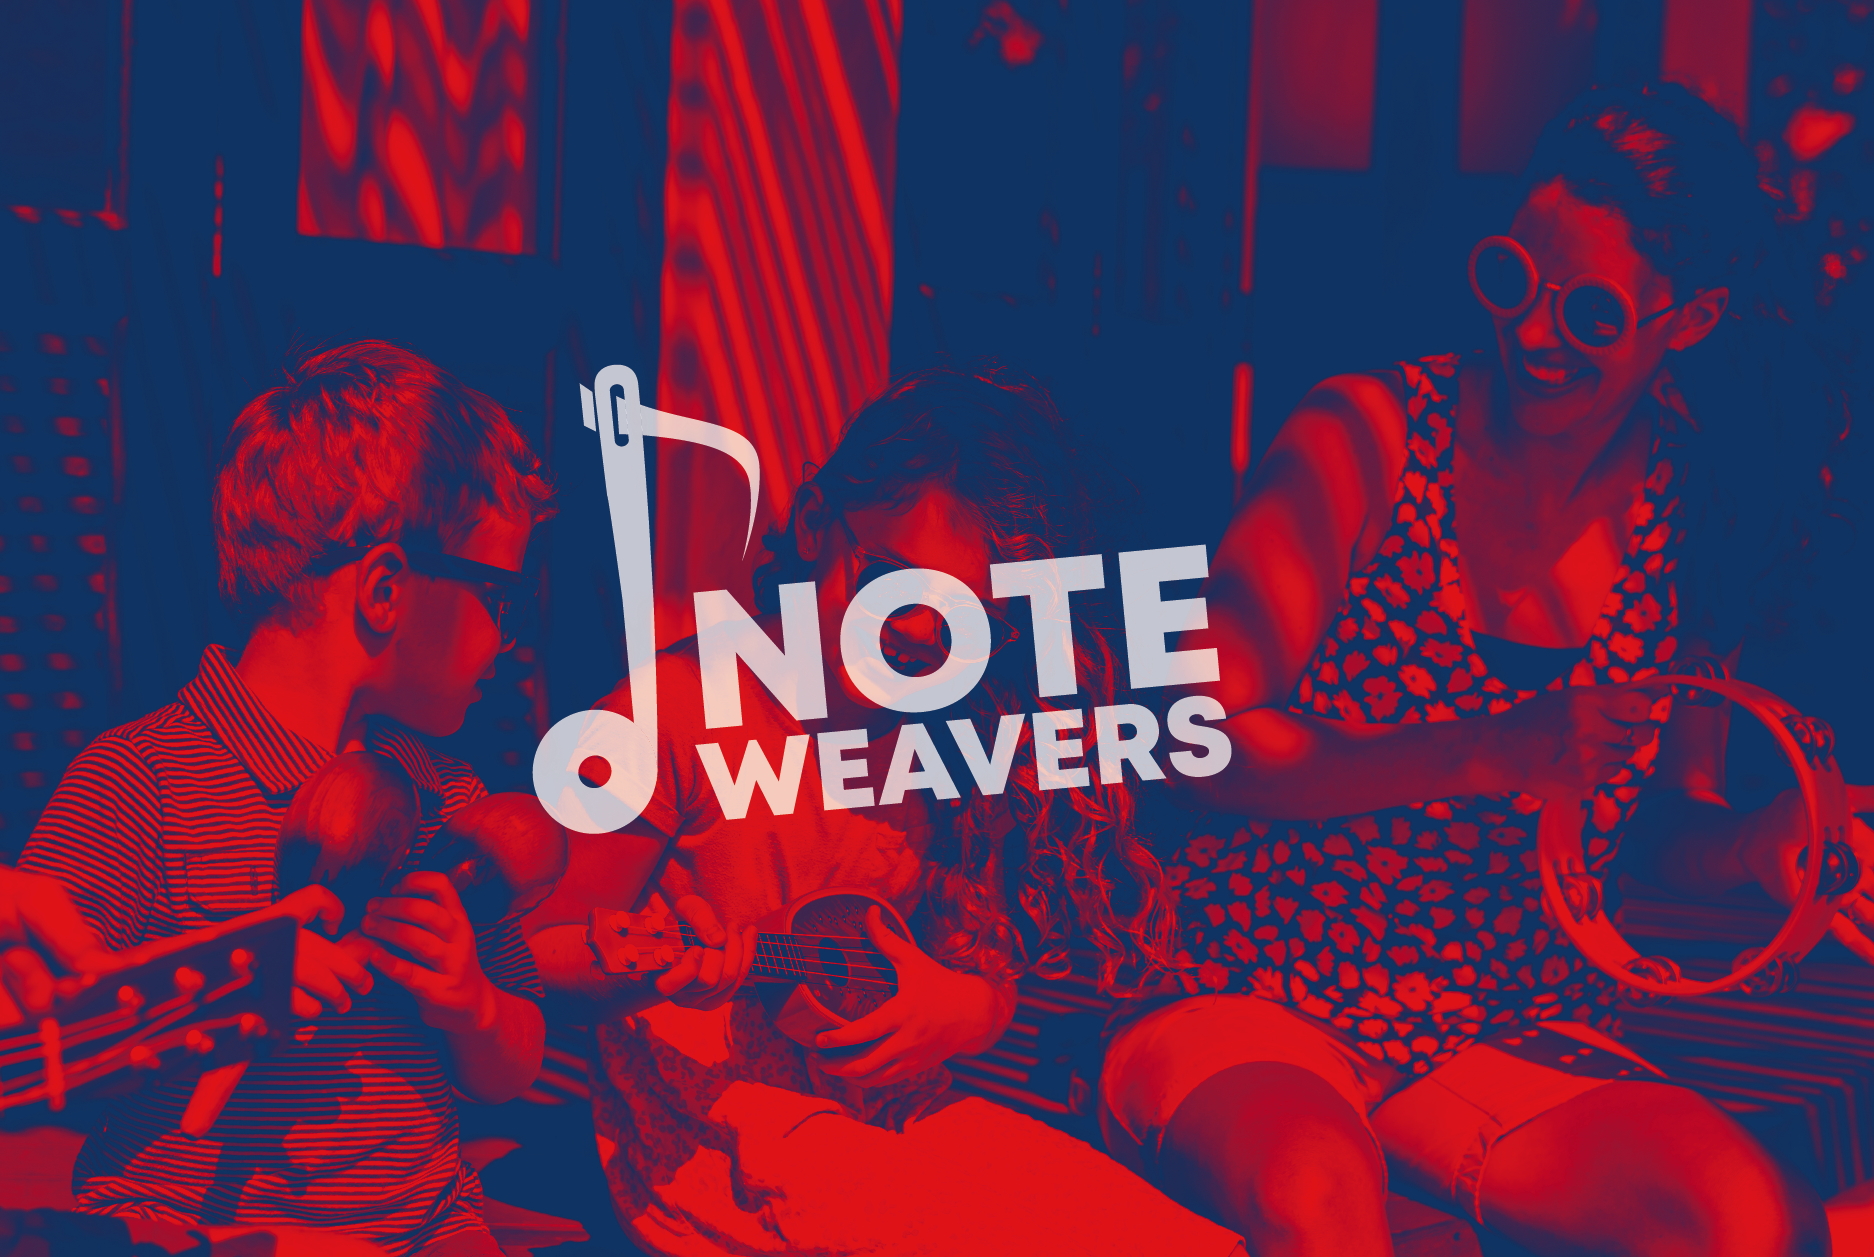 Noteweaver